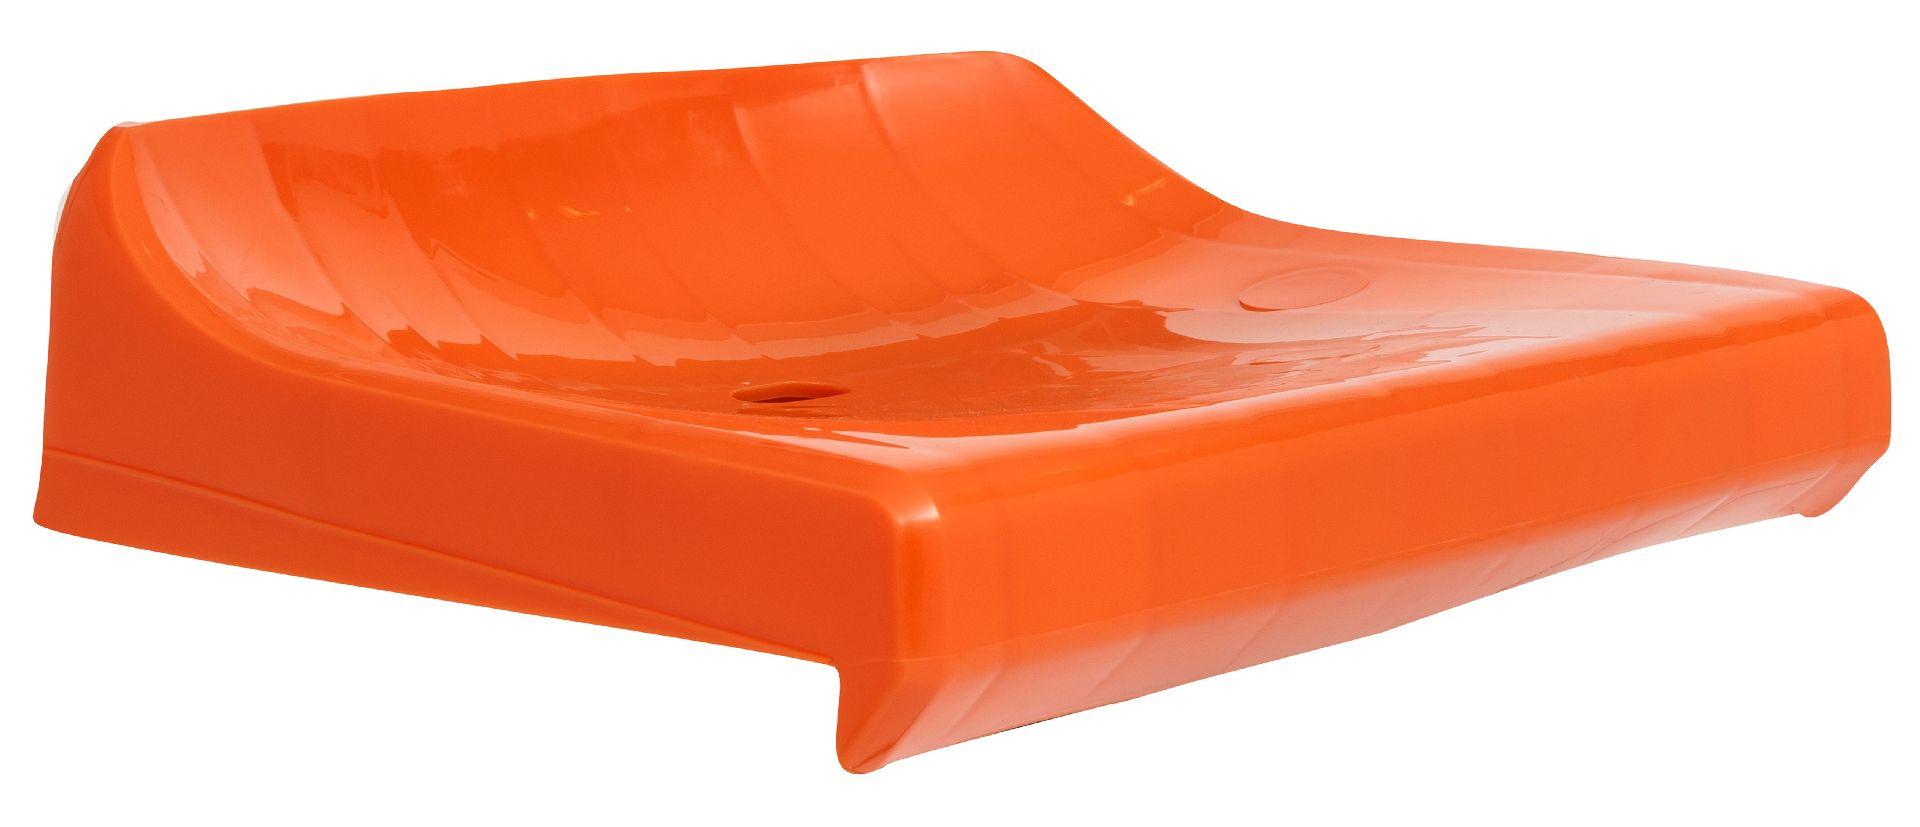 tema_backrest_monoblock_copolymer_pp_stadium_chair_seatorium_07